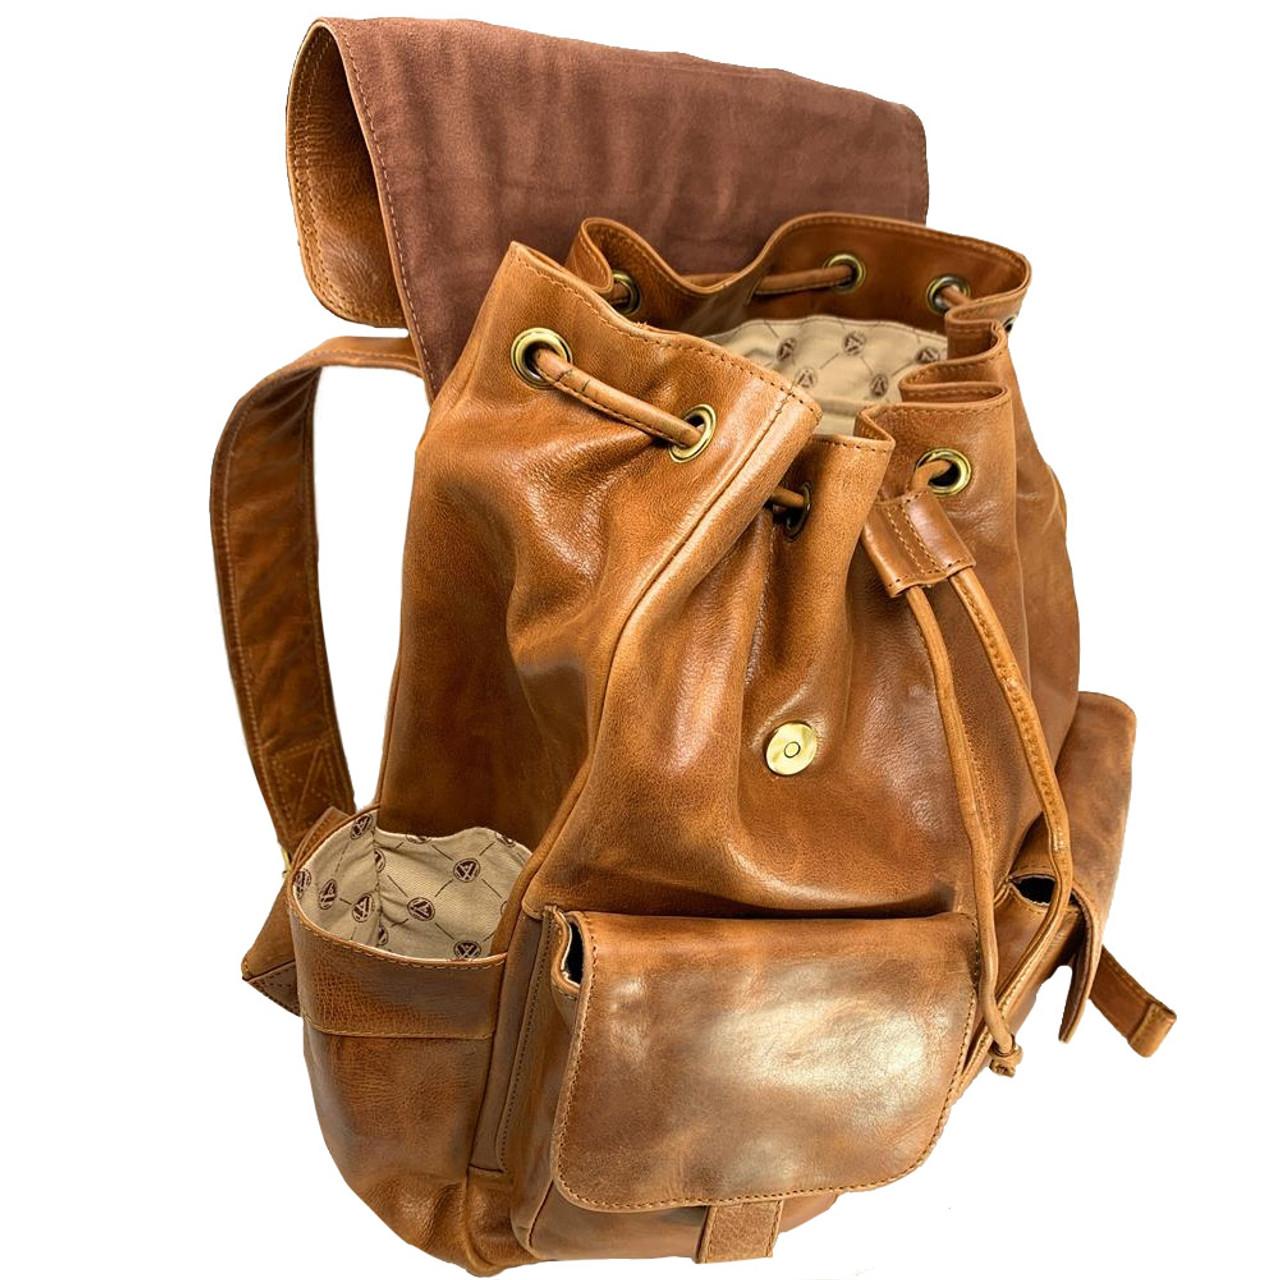 Clemson University Tigers Leather Rucksack Tan Westbridge Backpack